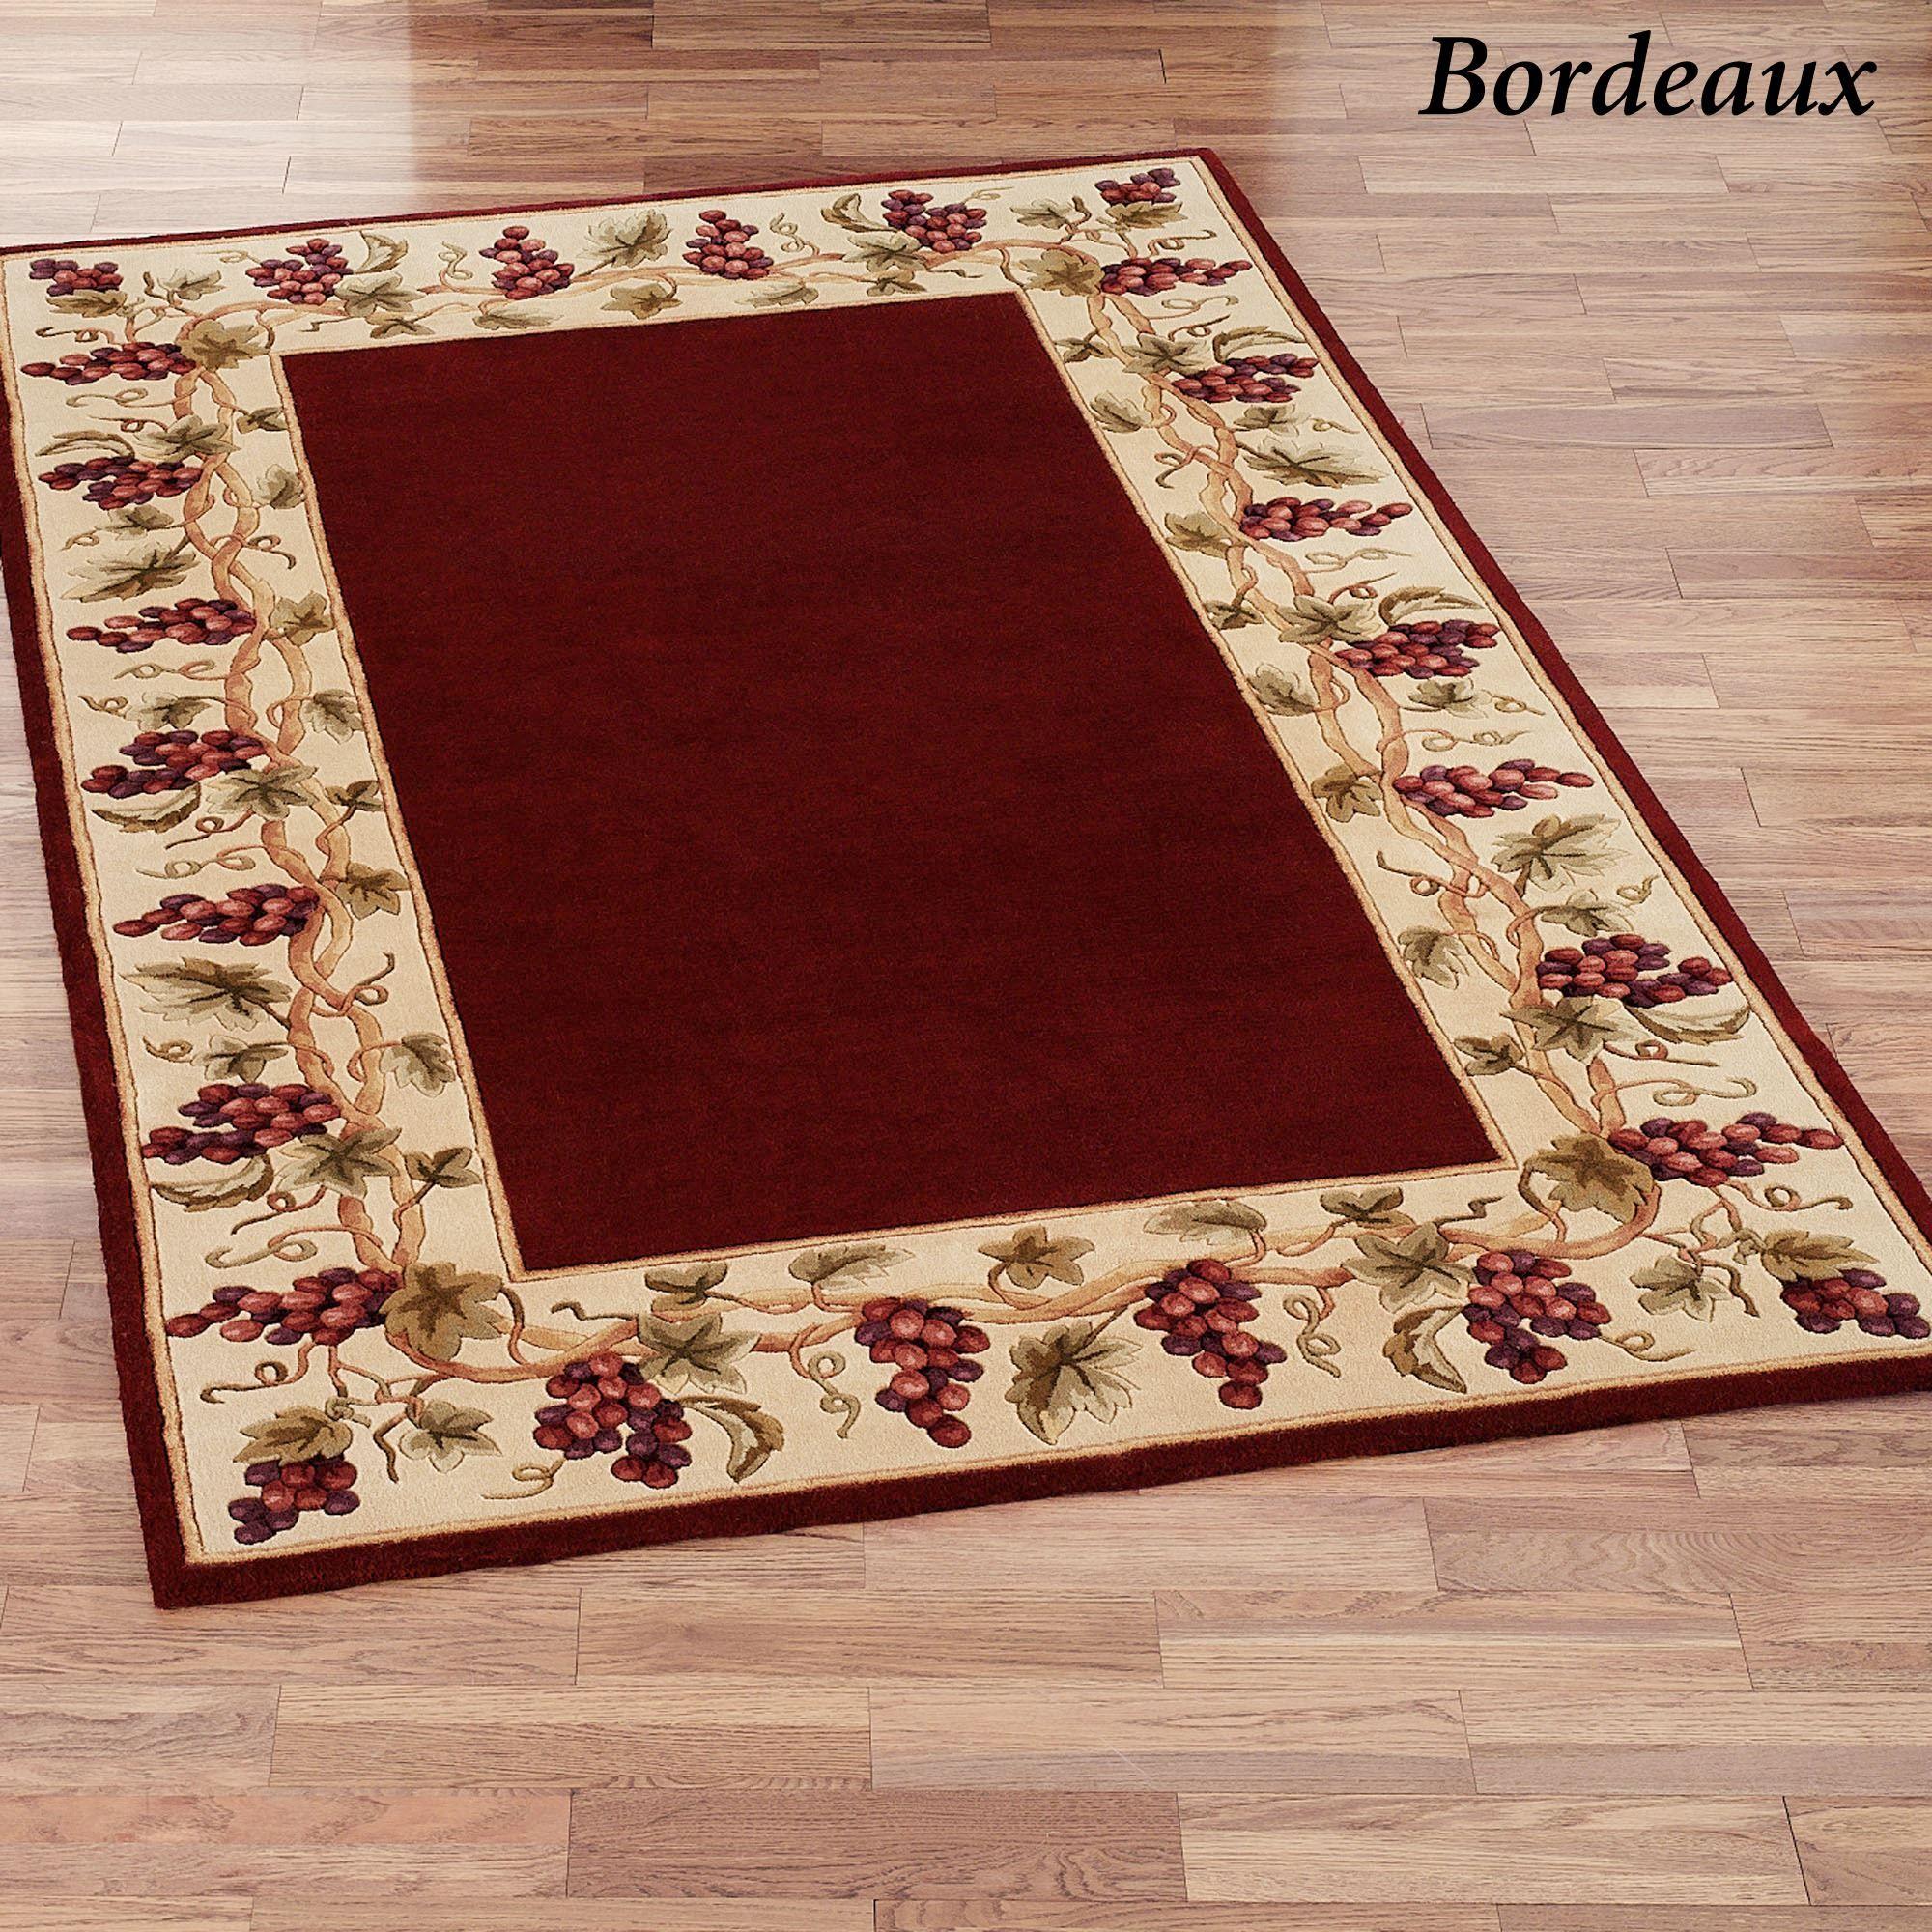 Bordeaux Grape Border Wool Round Rug